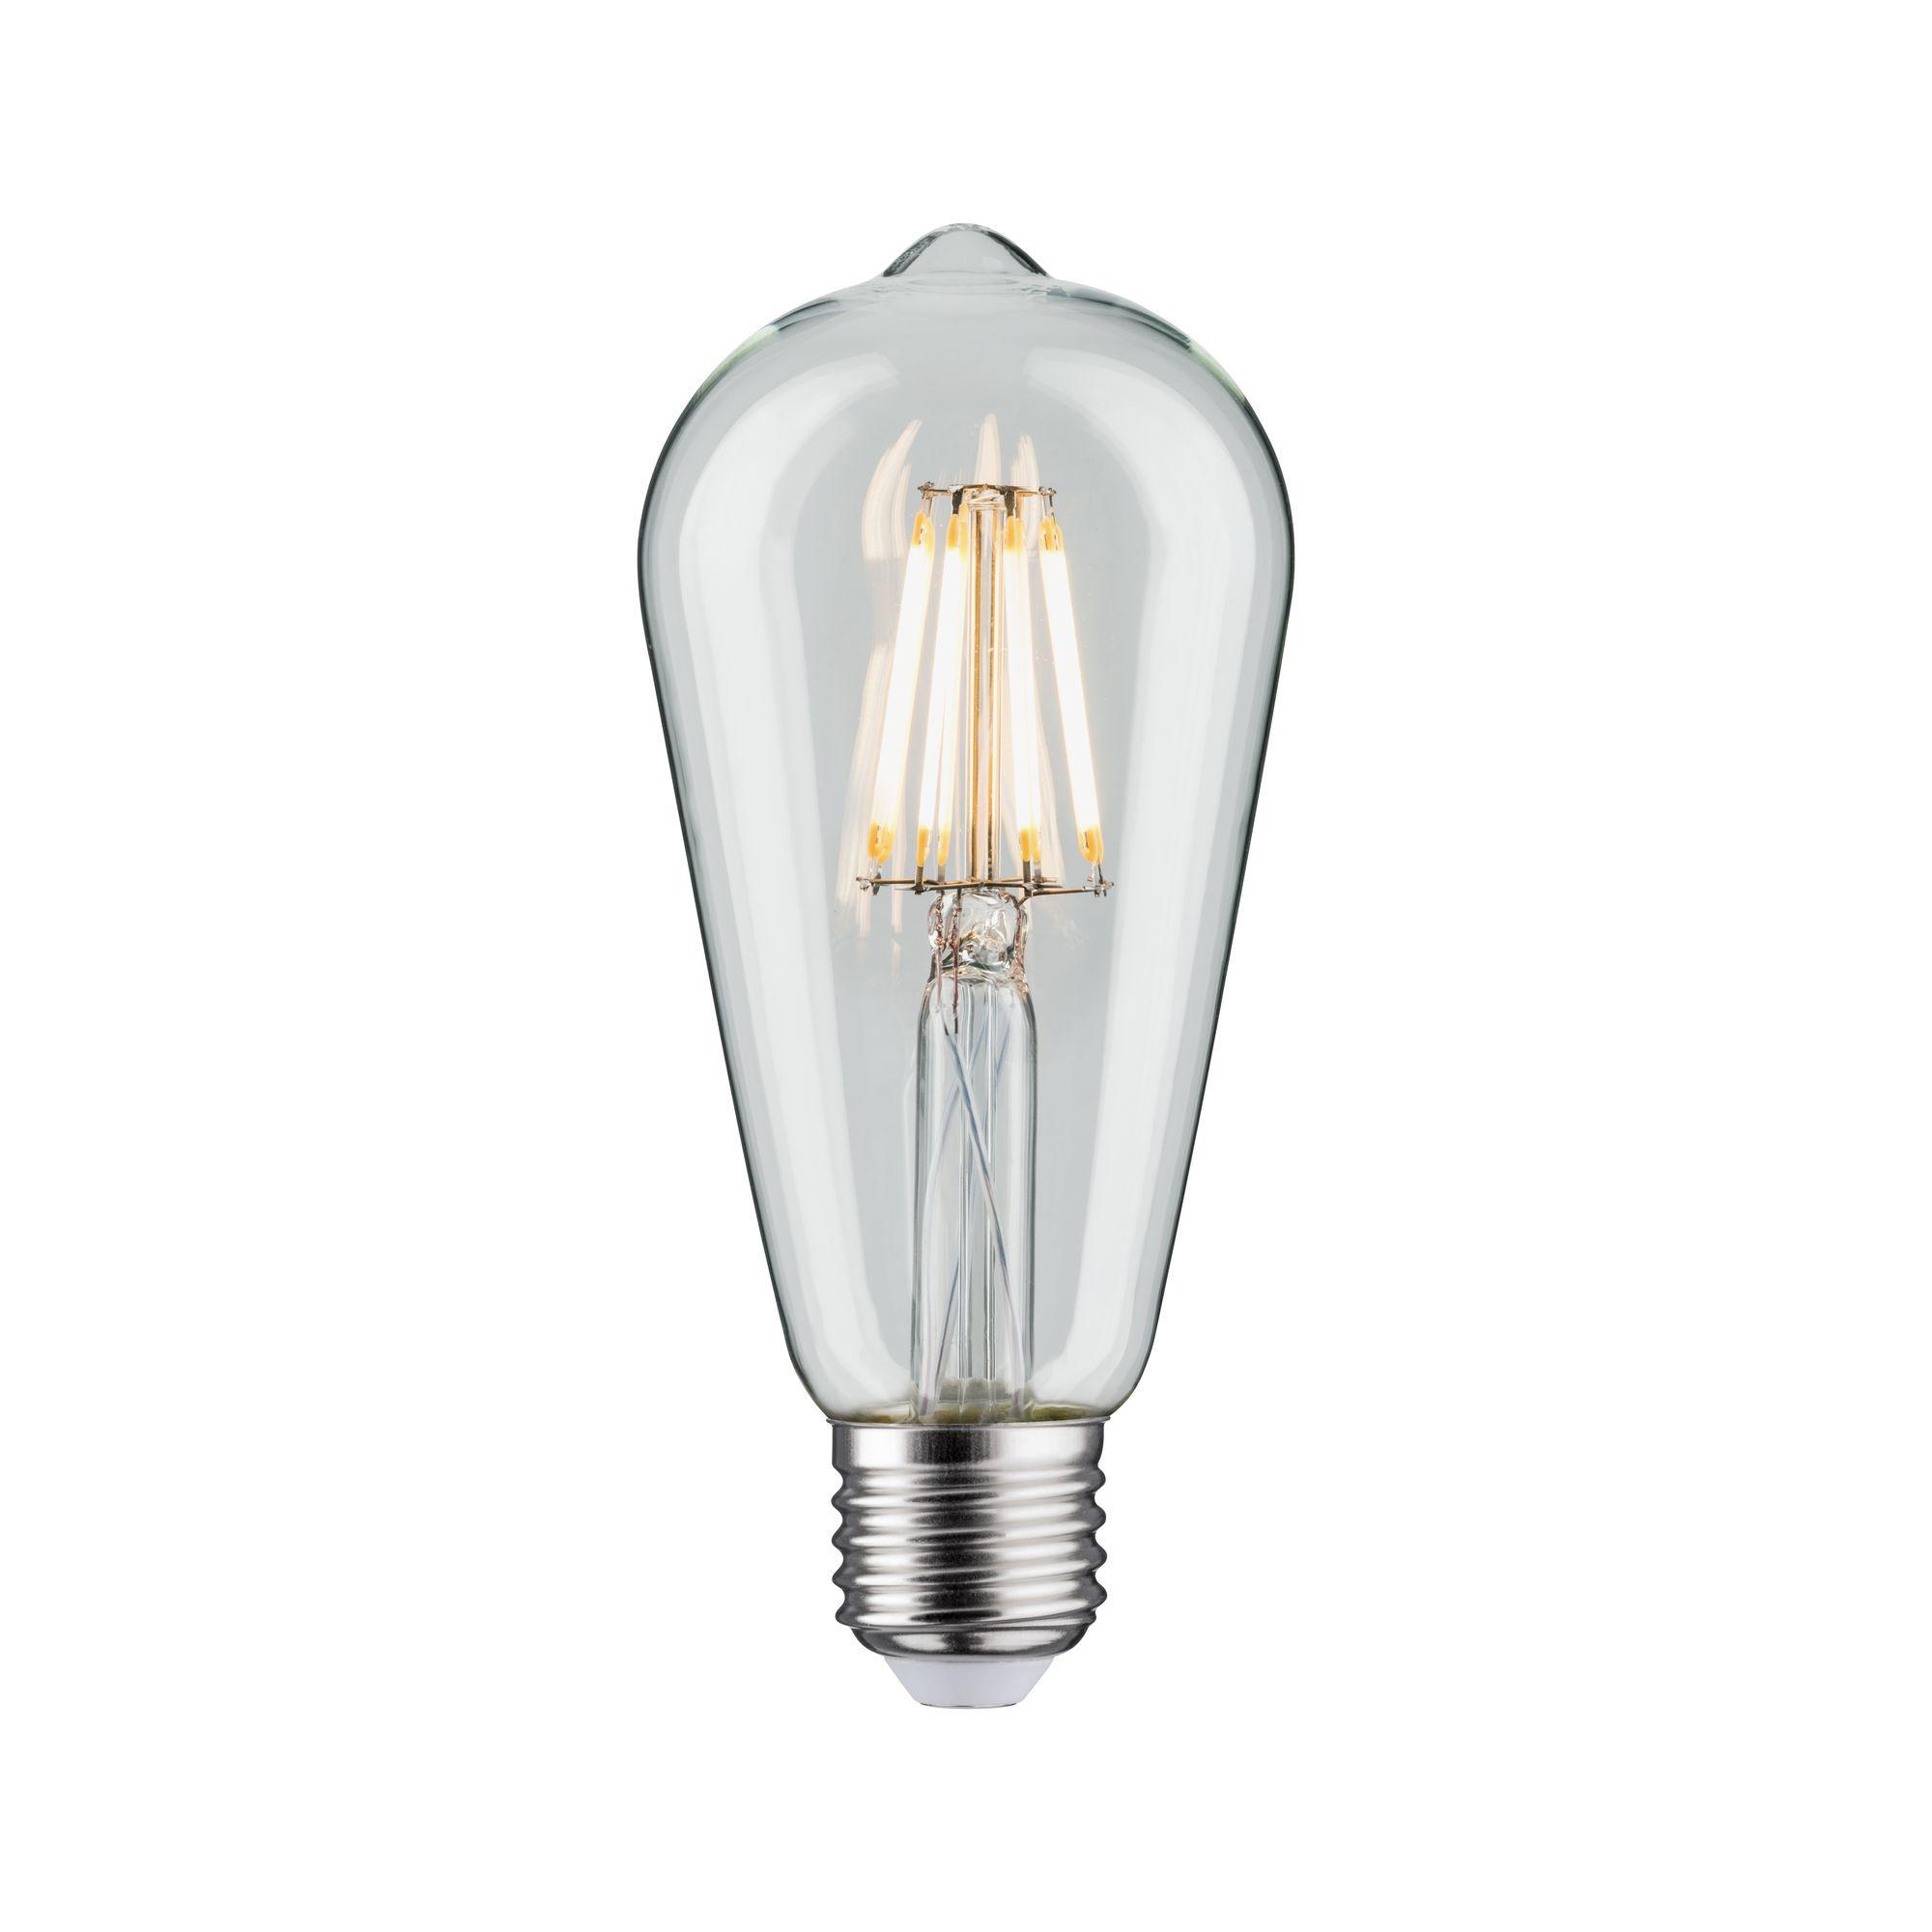 Лампа филаментная Paulmann Retro ST64 7.5Вт 806лм 2700К E27 230В Прозрачный 28425.